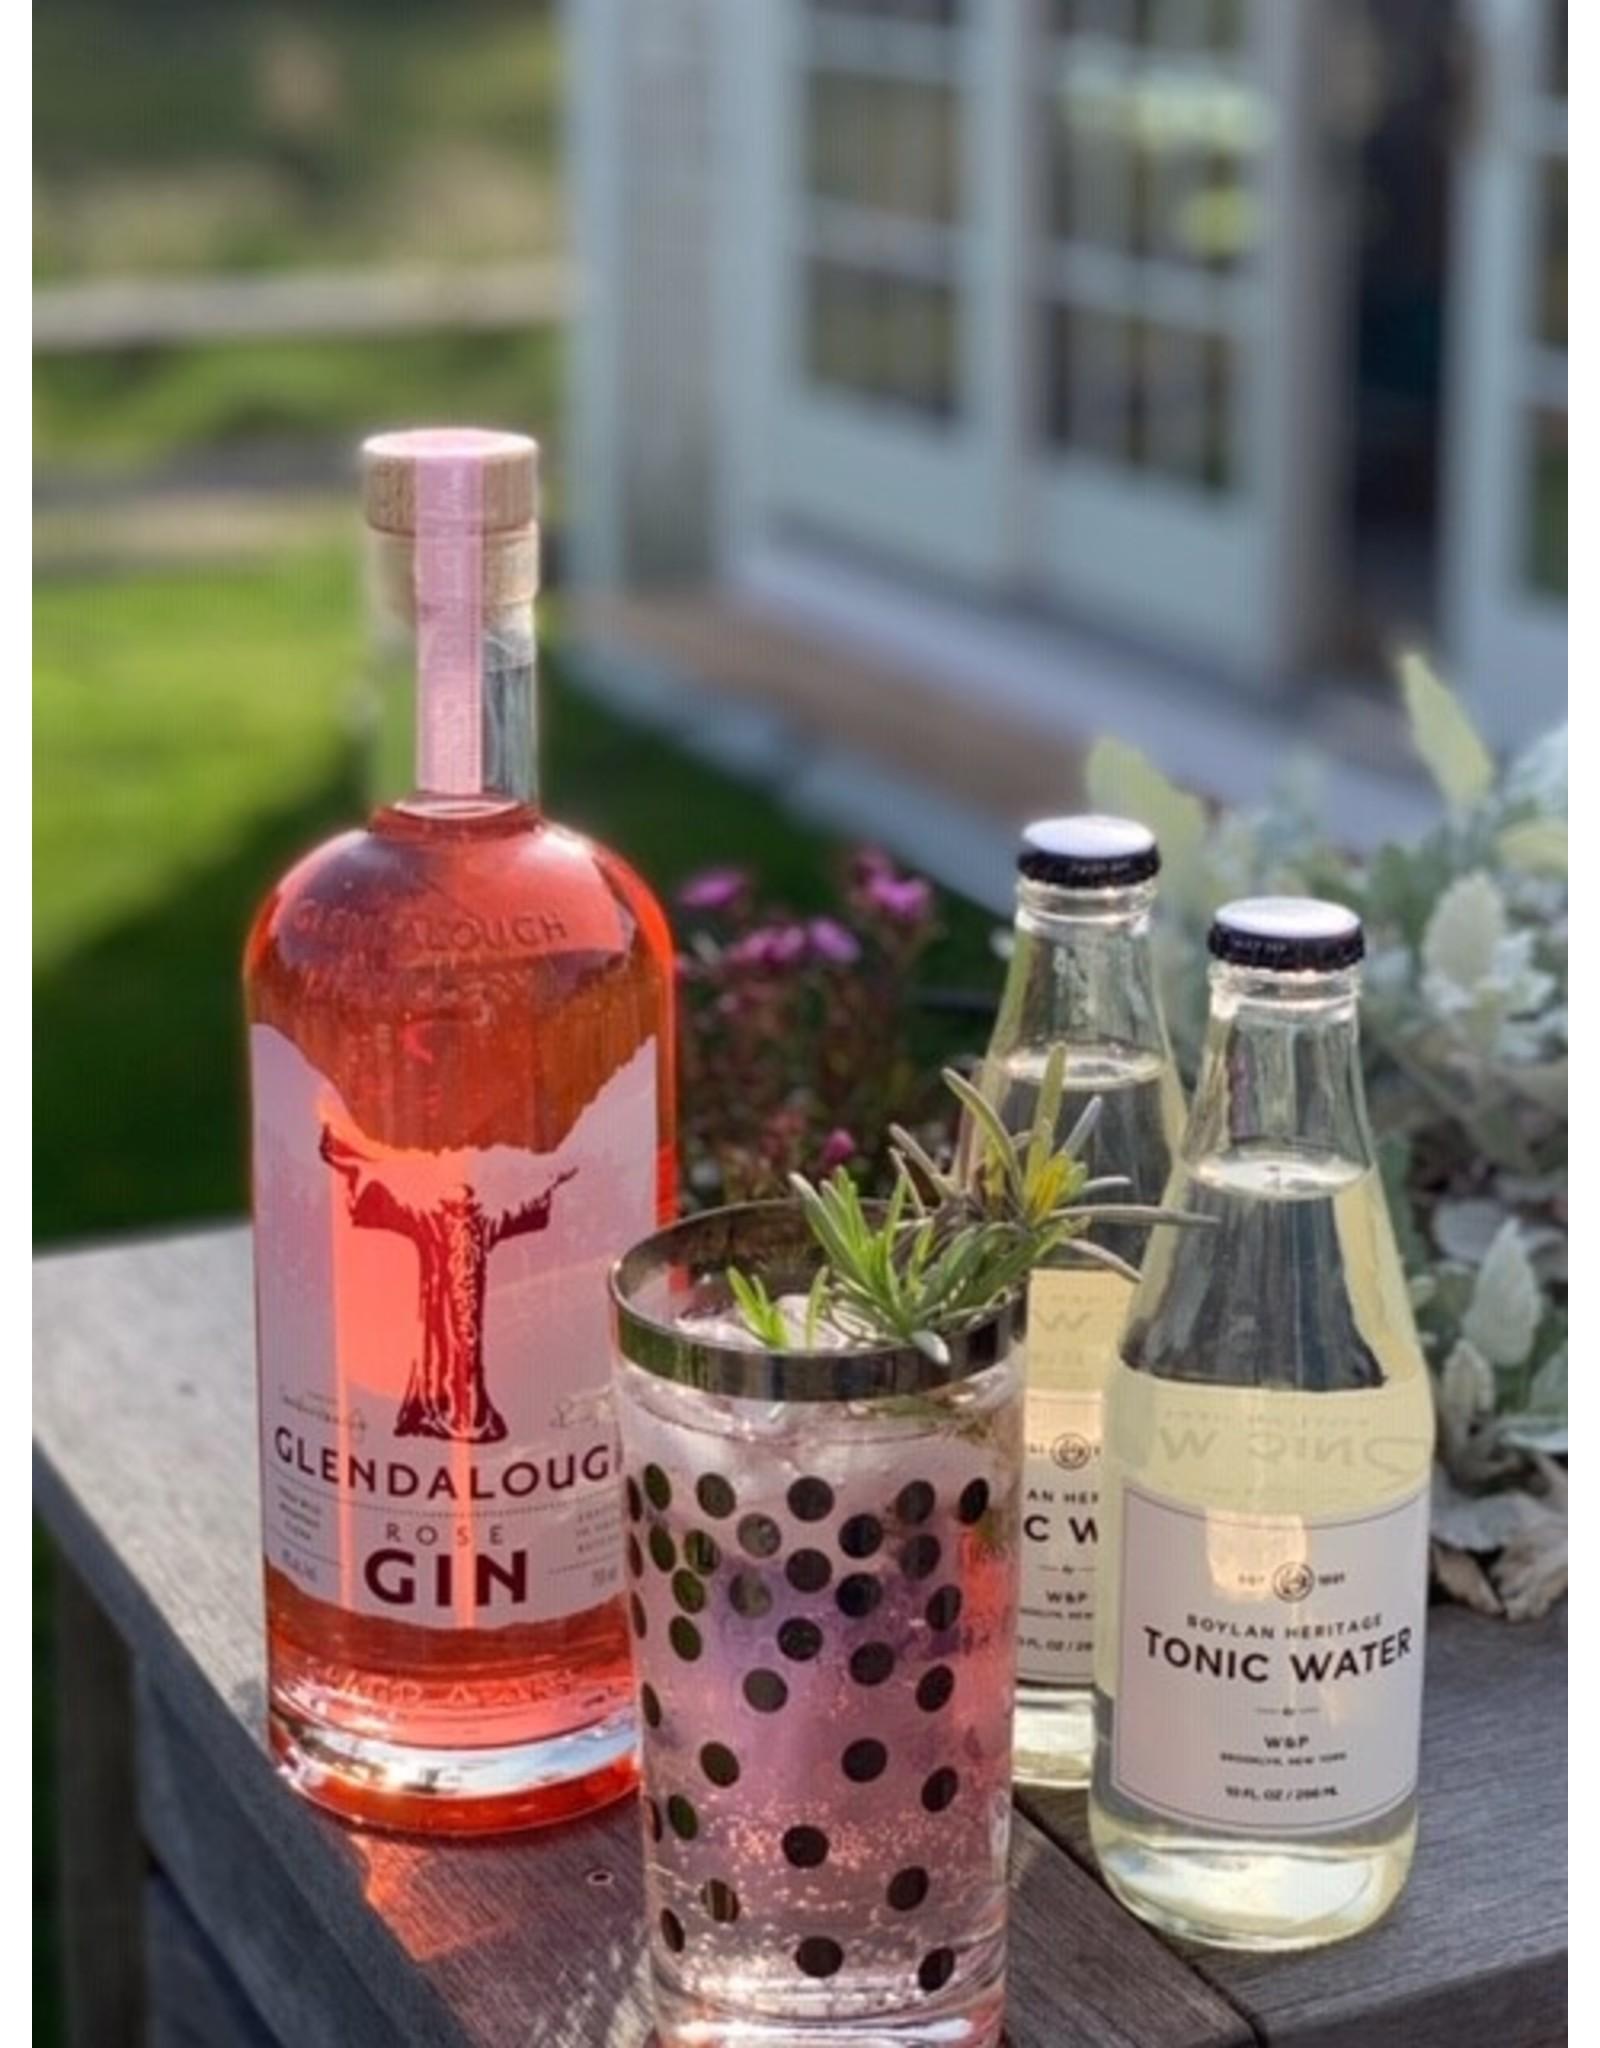 The June BRIX Mix—Glendalough Rose Gin & Tonic